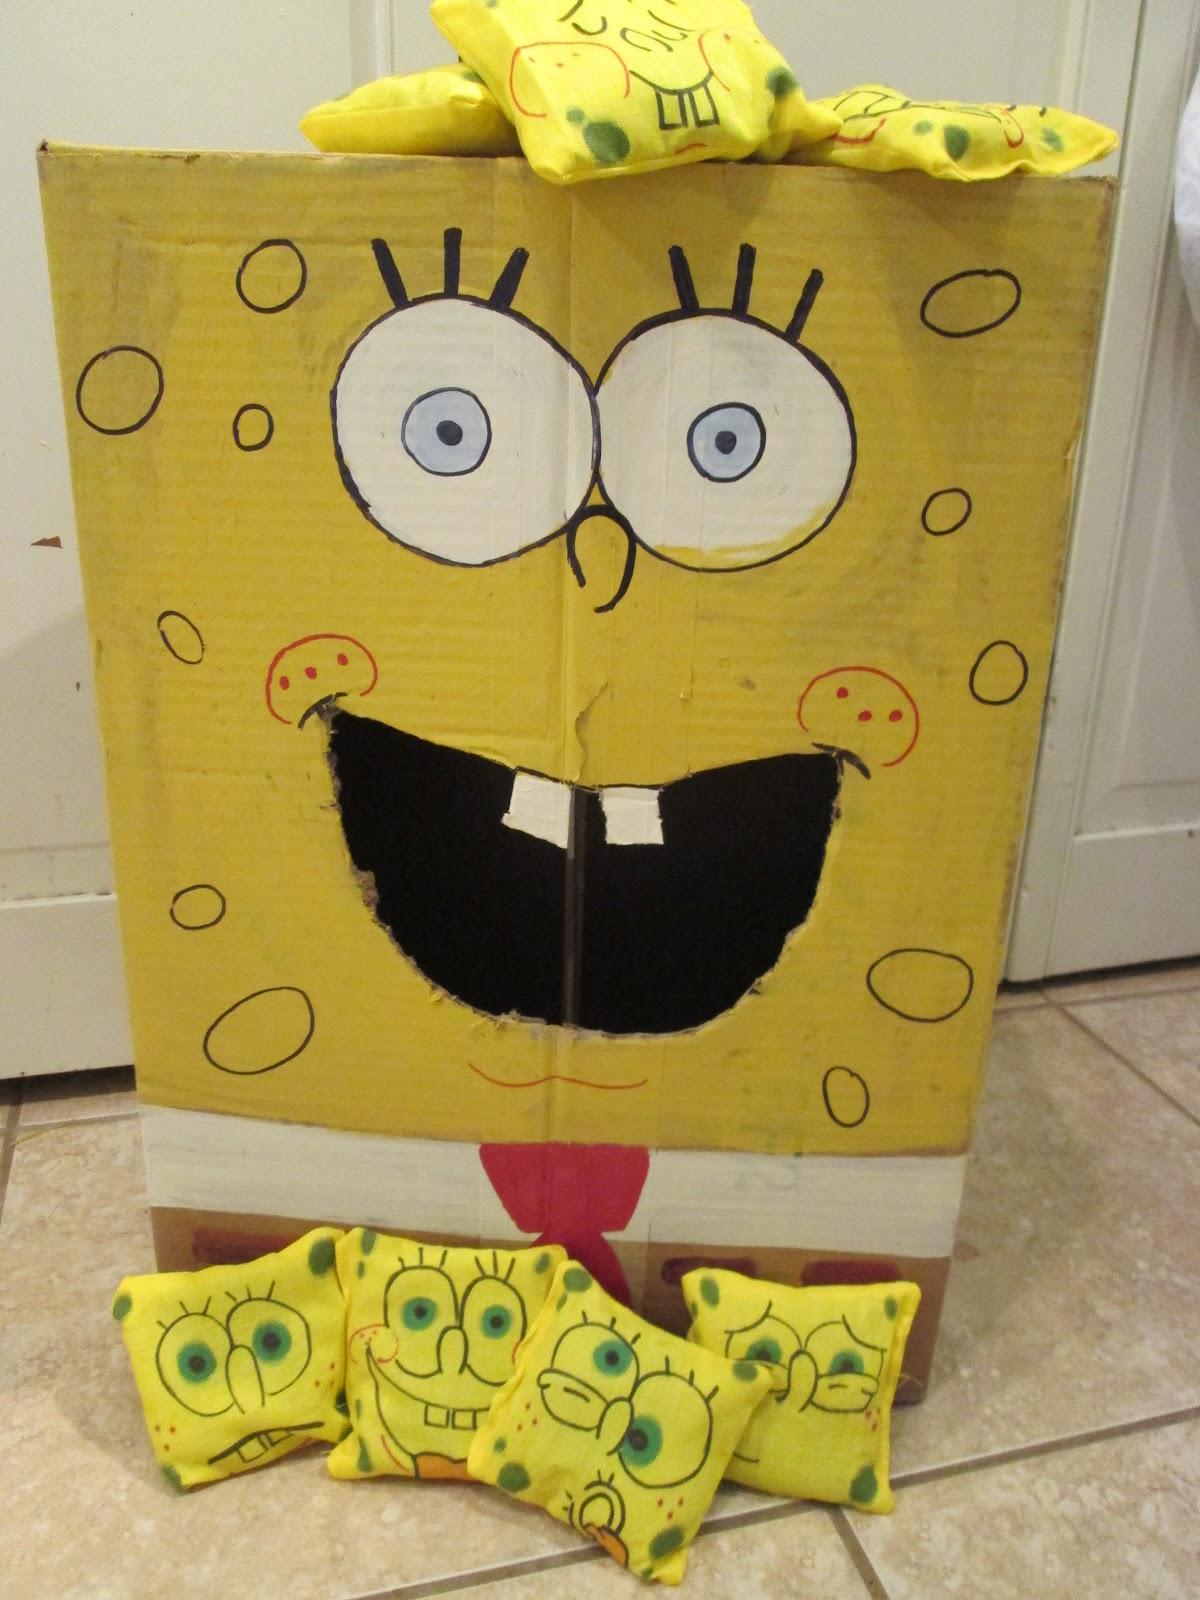 Walk In The Sunshine Spongebob Squarepants Bean Bag Toss Game